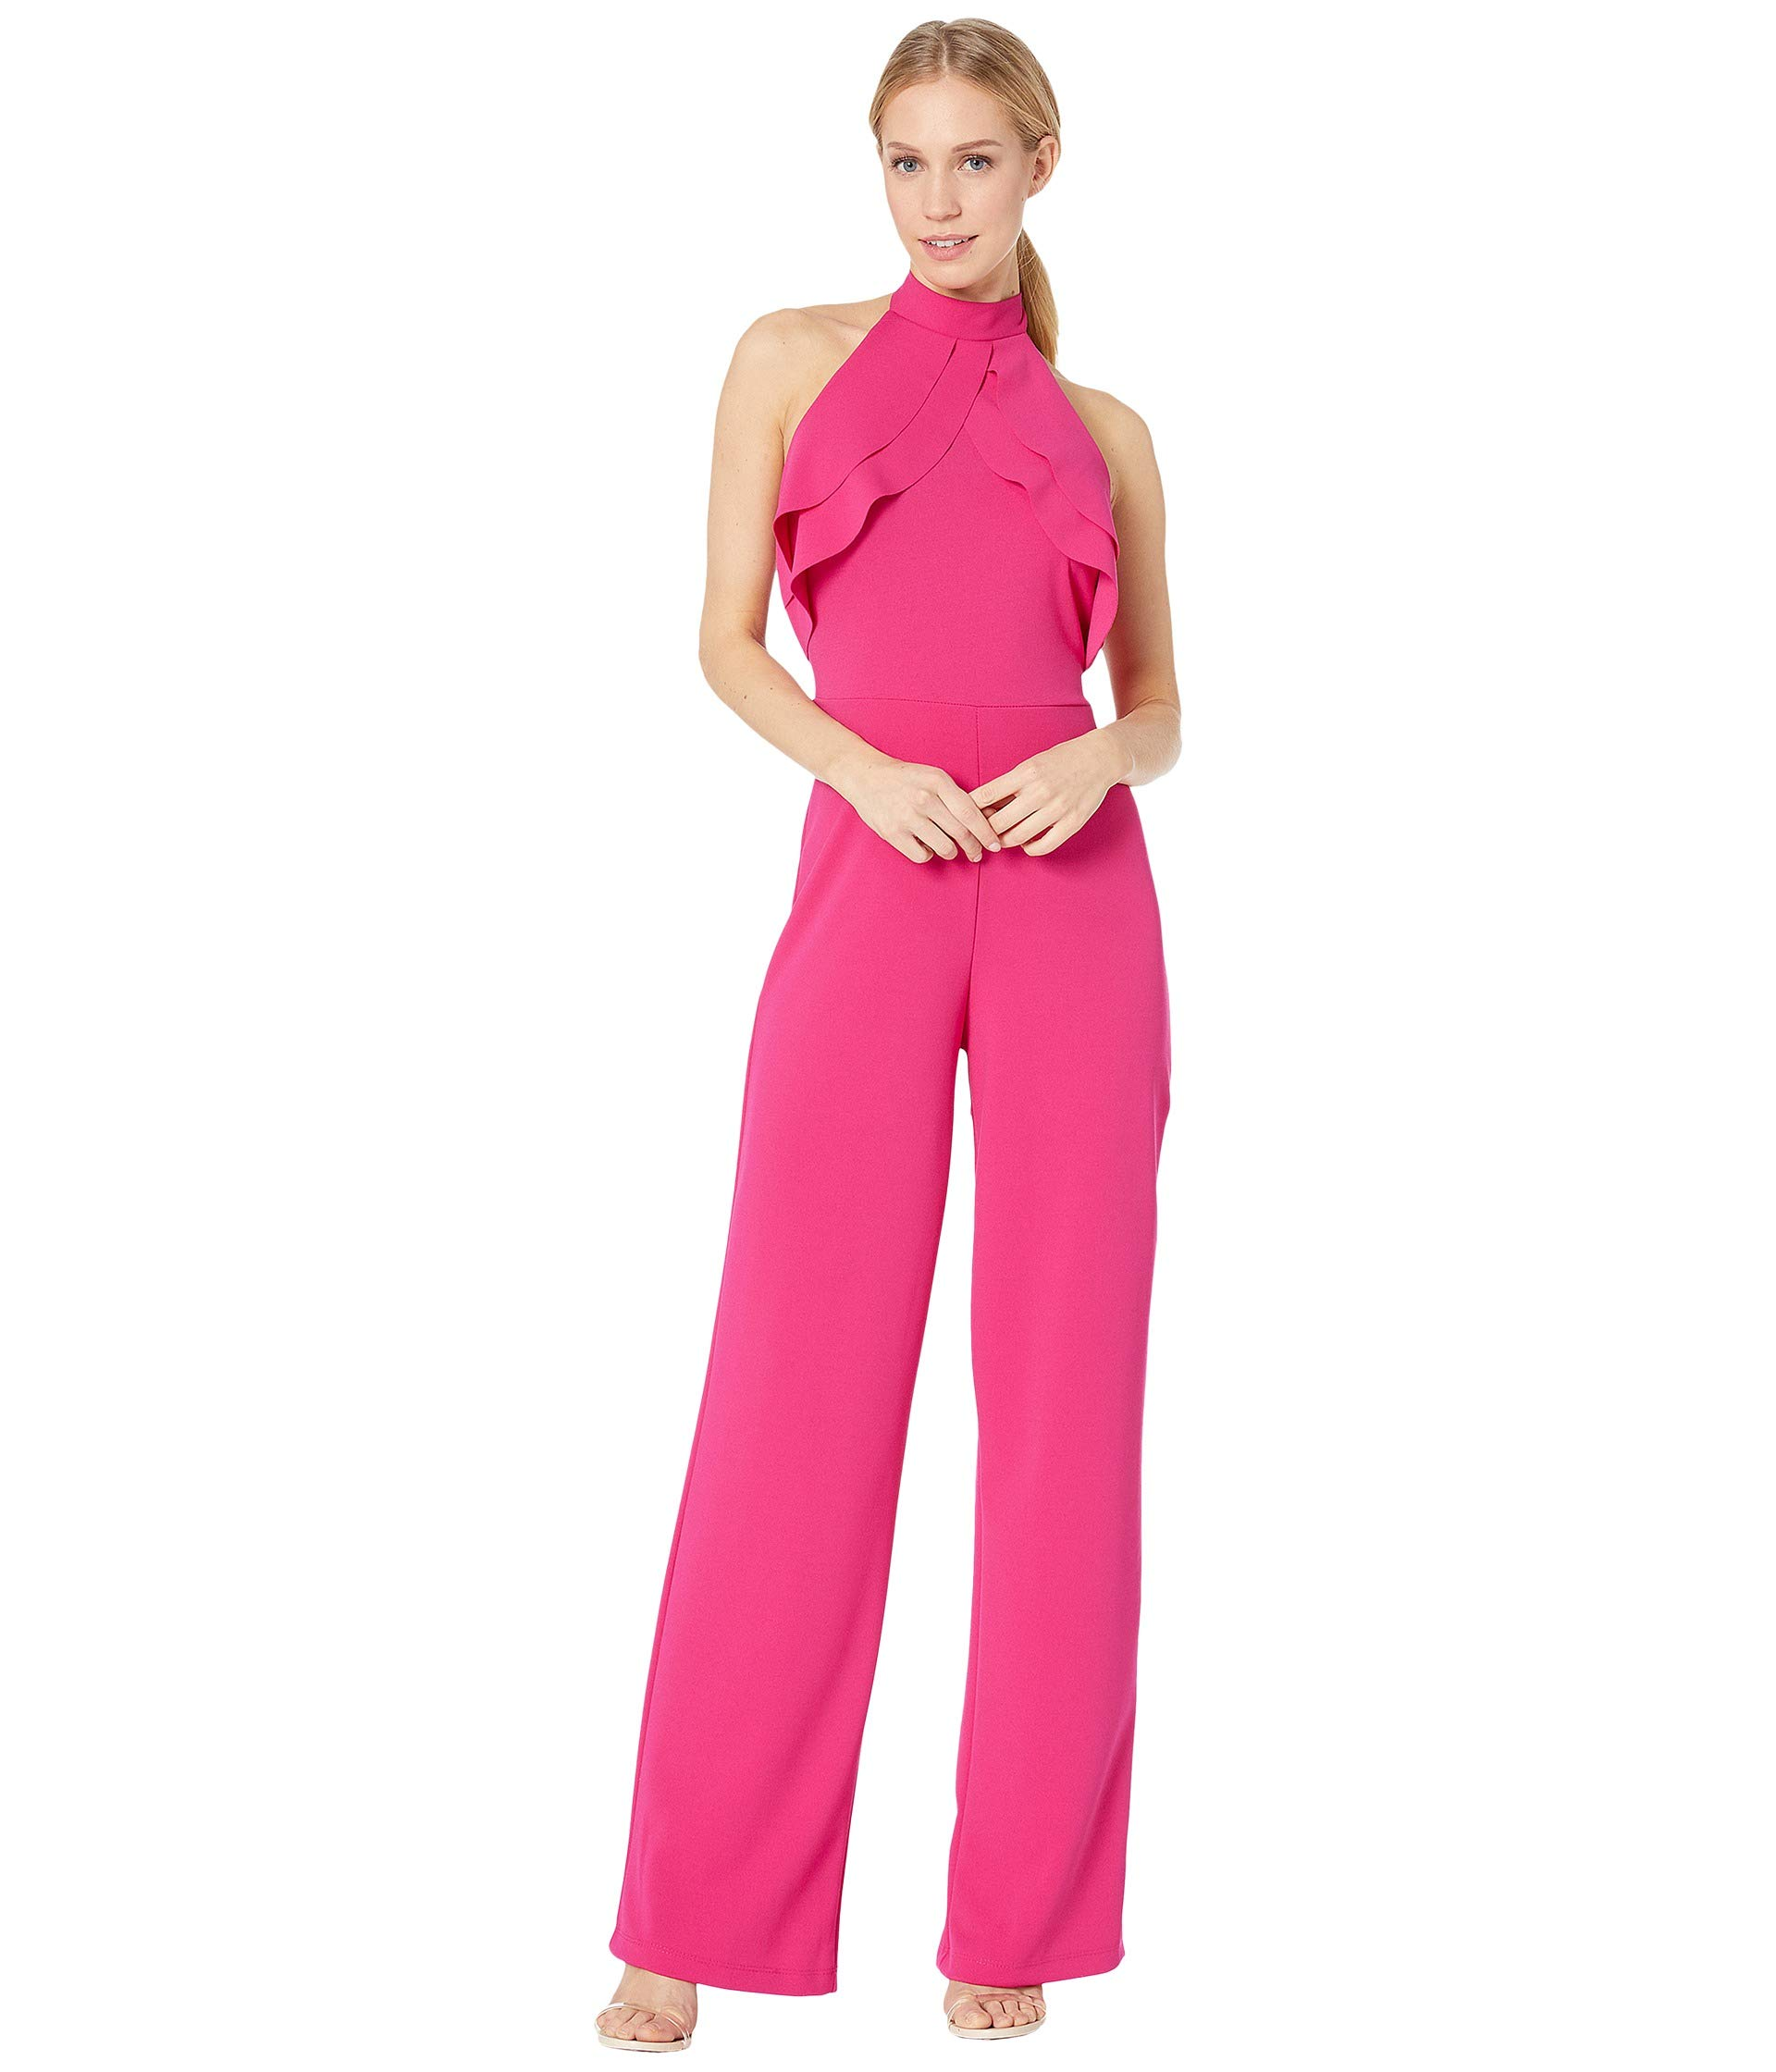 bebe Women's Ruffle Halter Neck Jumpsuit Strawberry 2